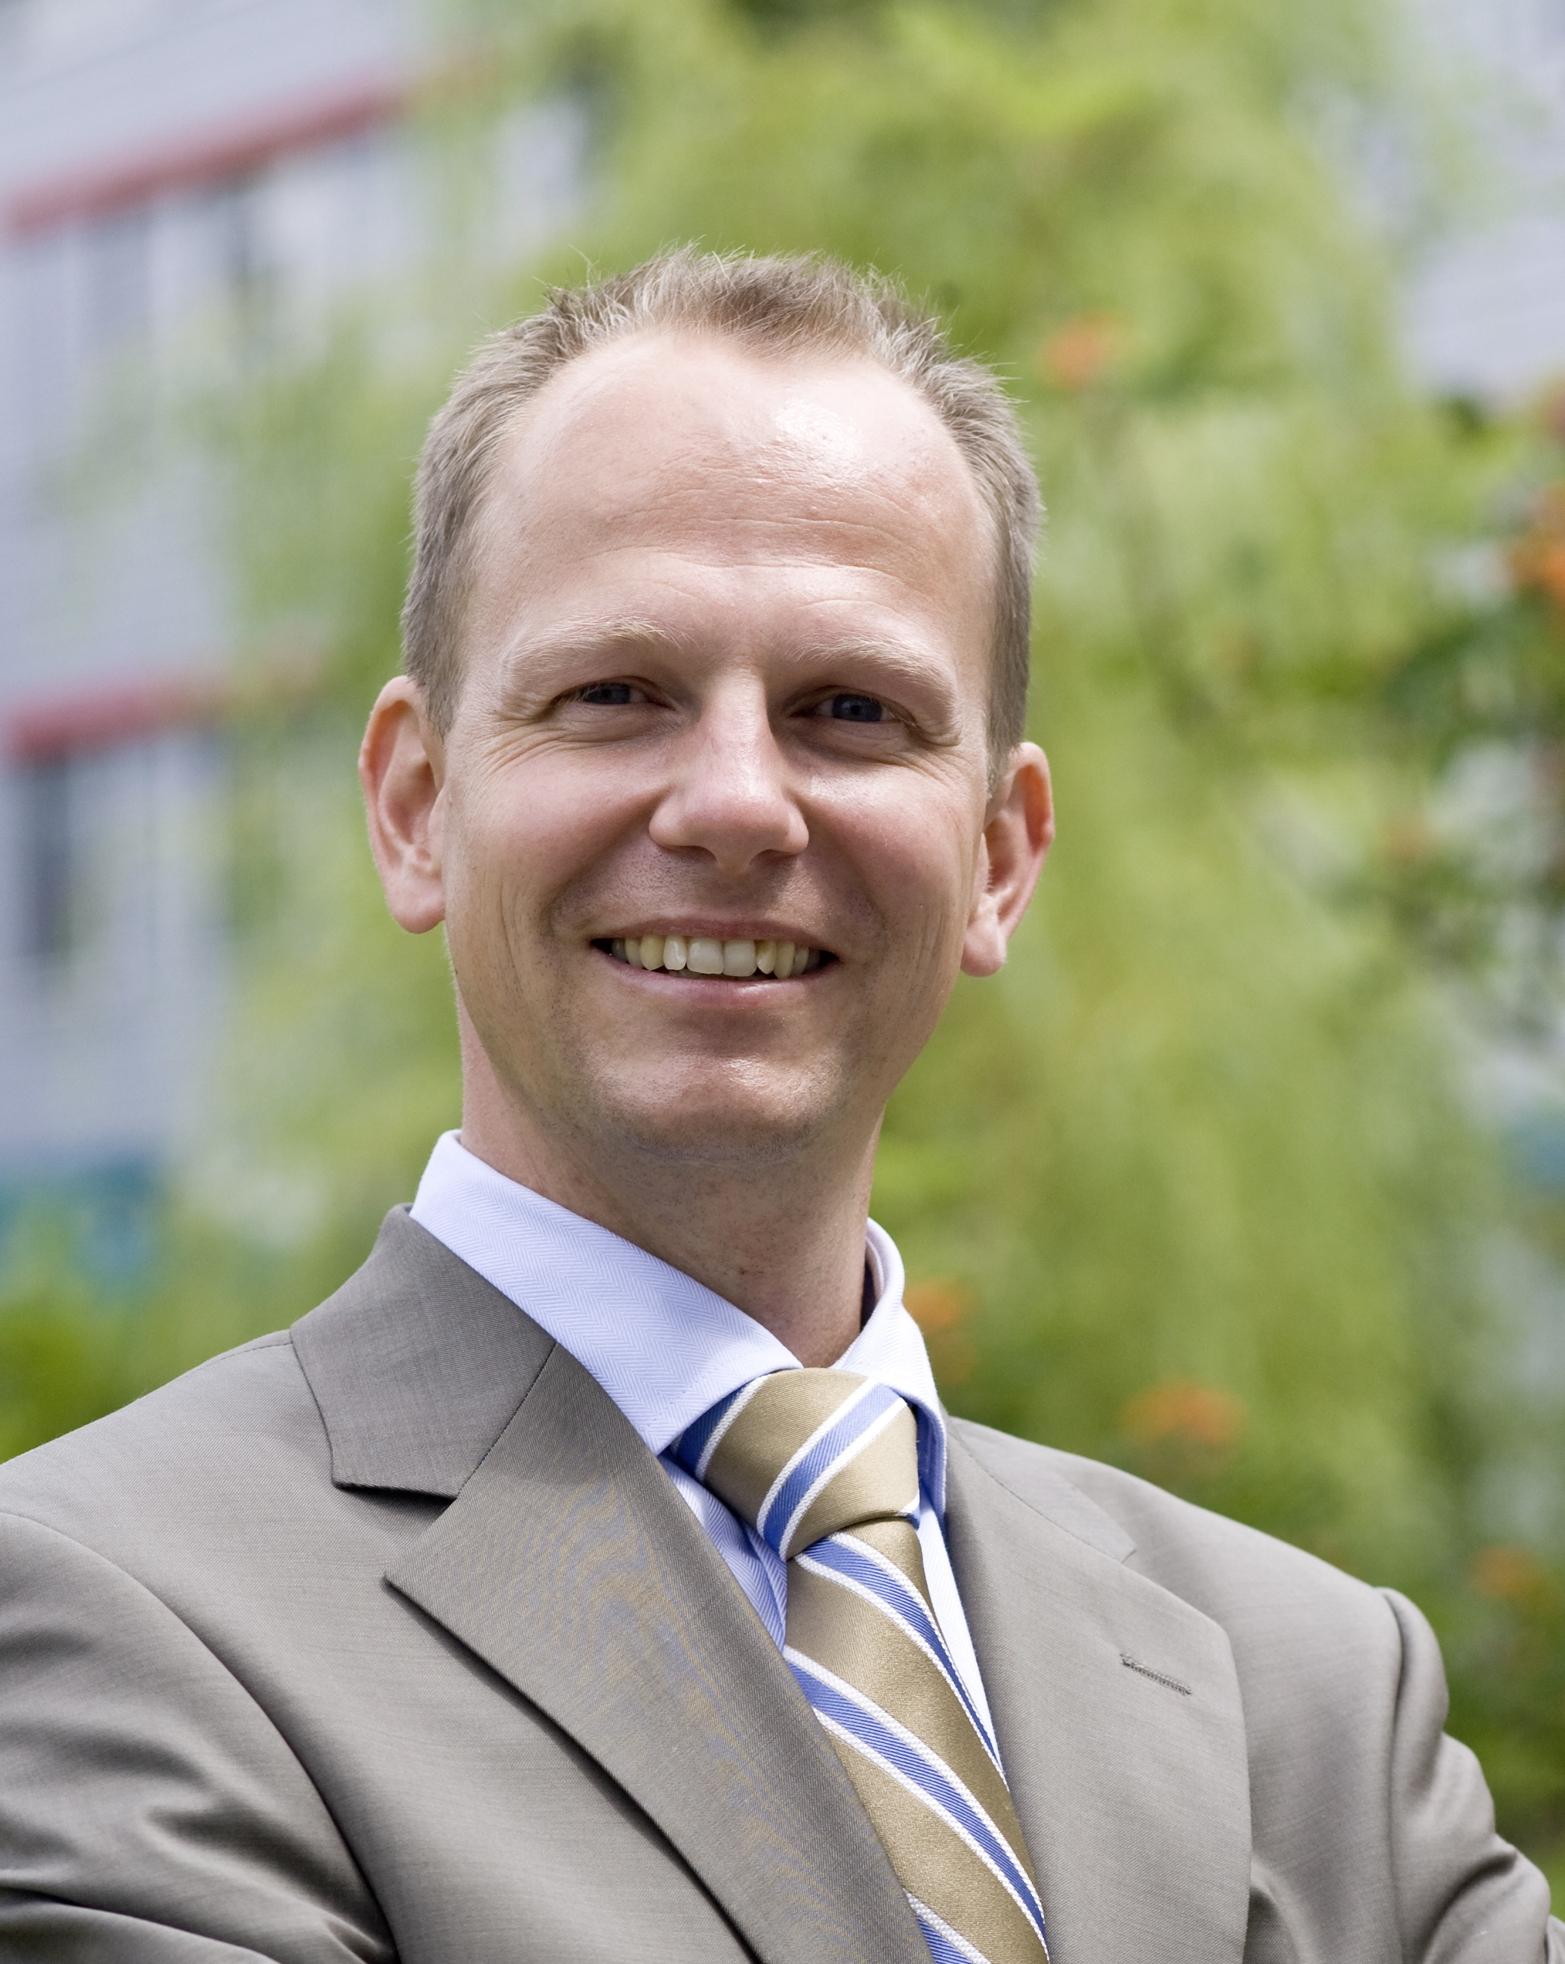 Michael Geier